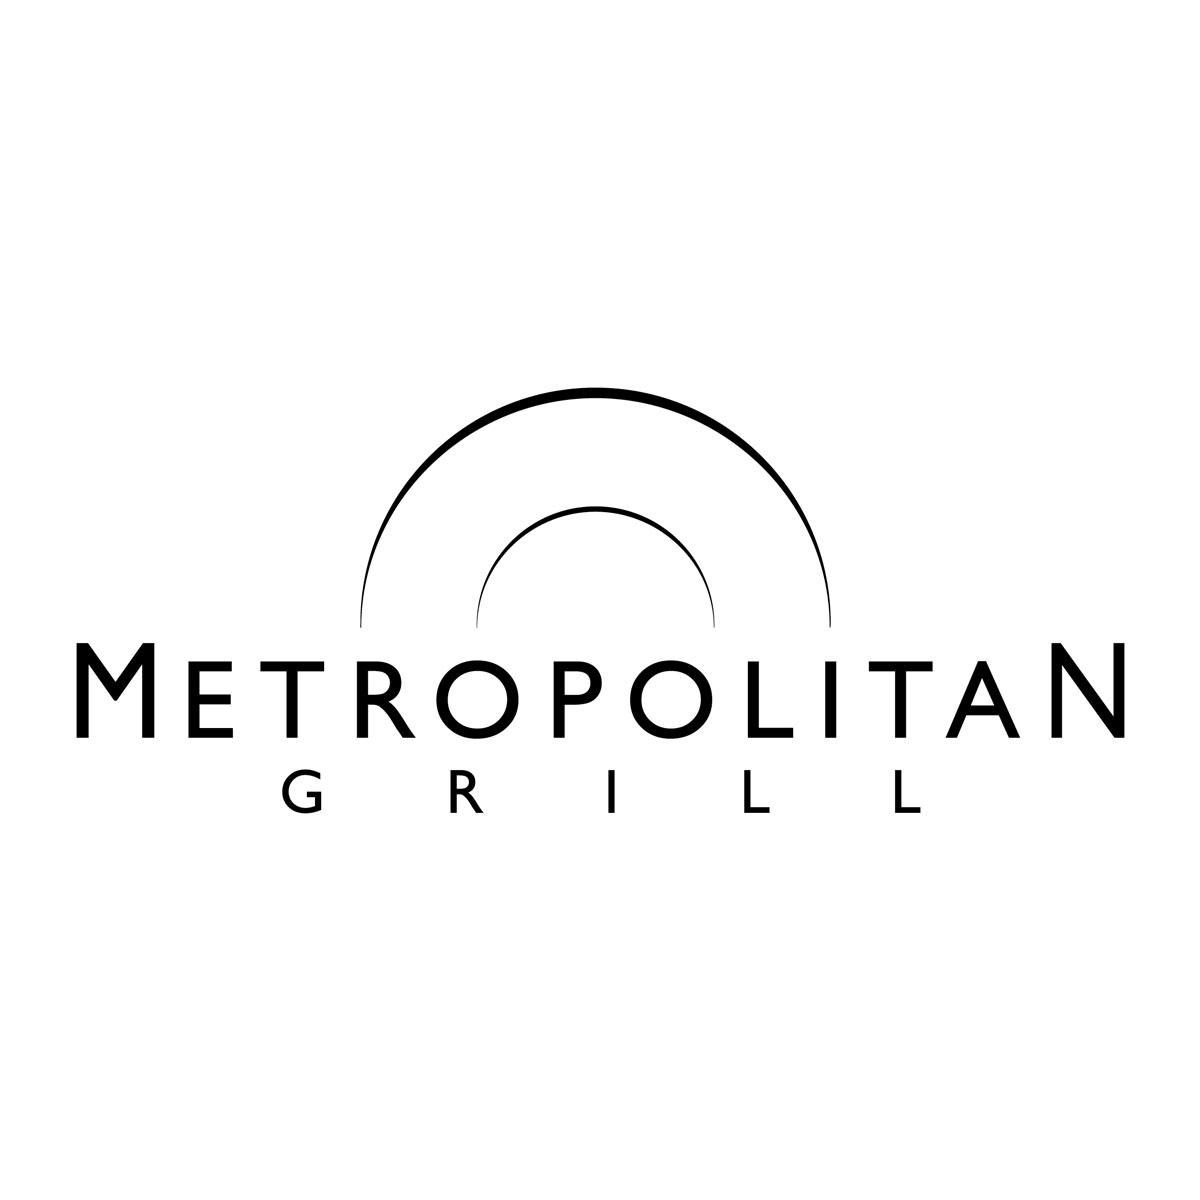 Metropolitan Grill Restaurant